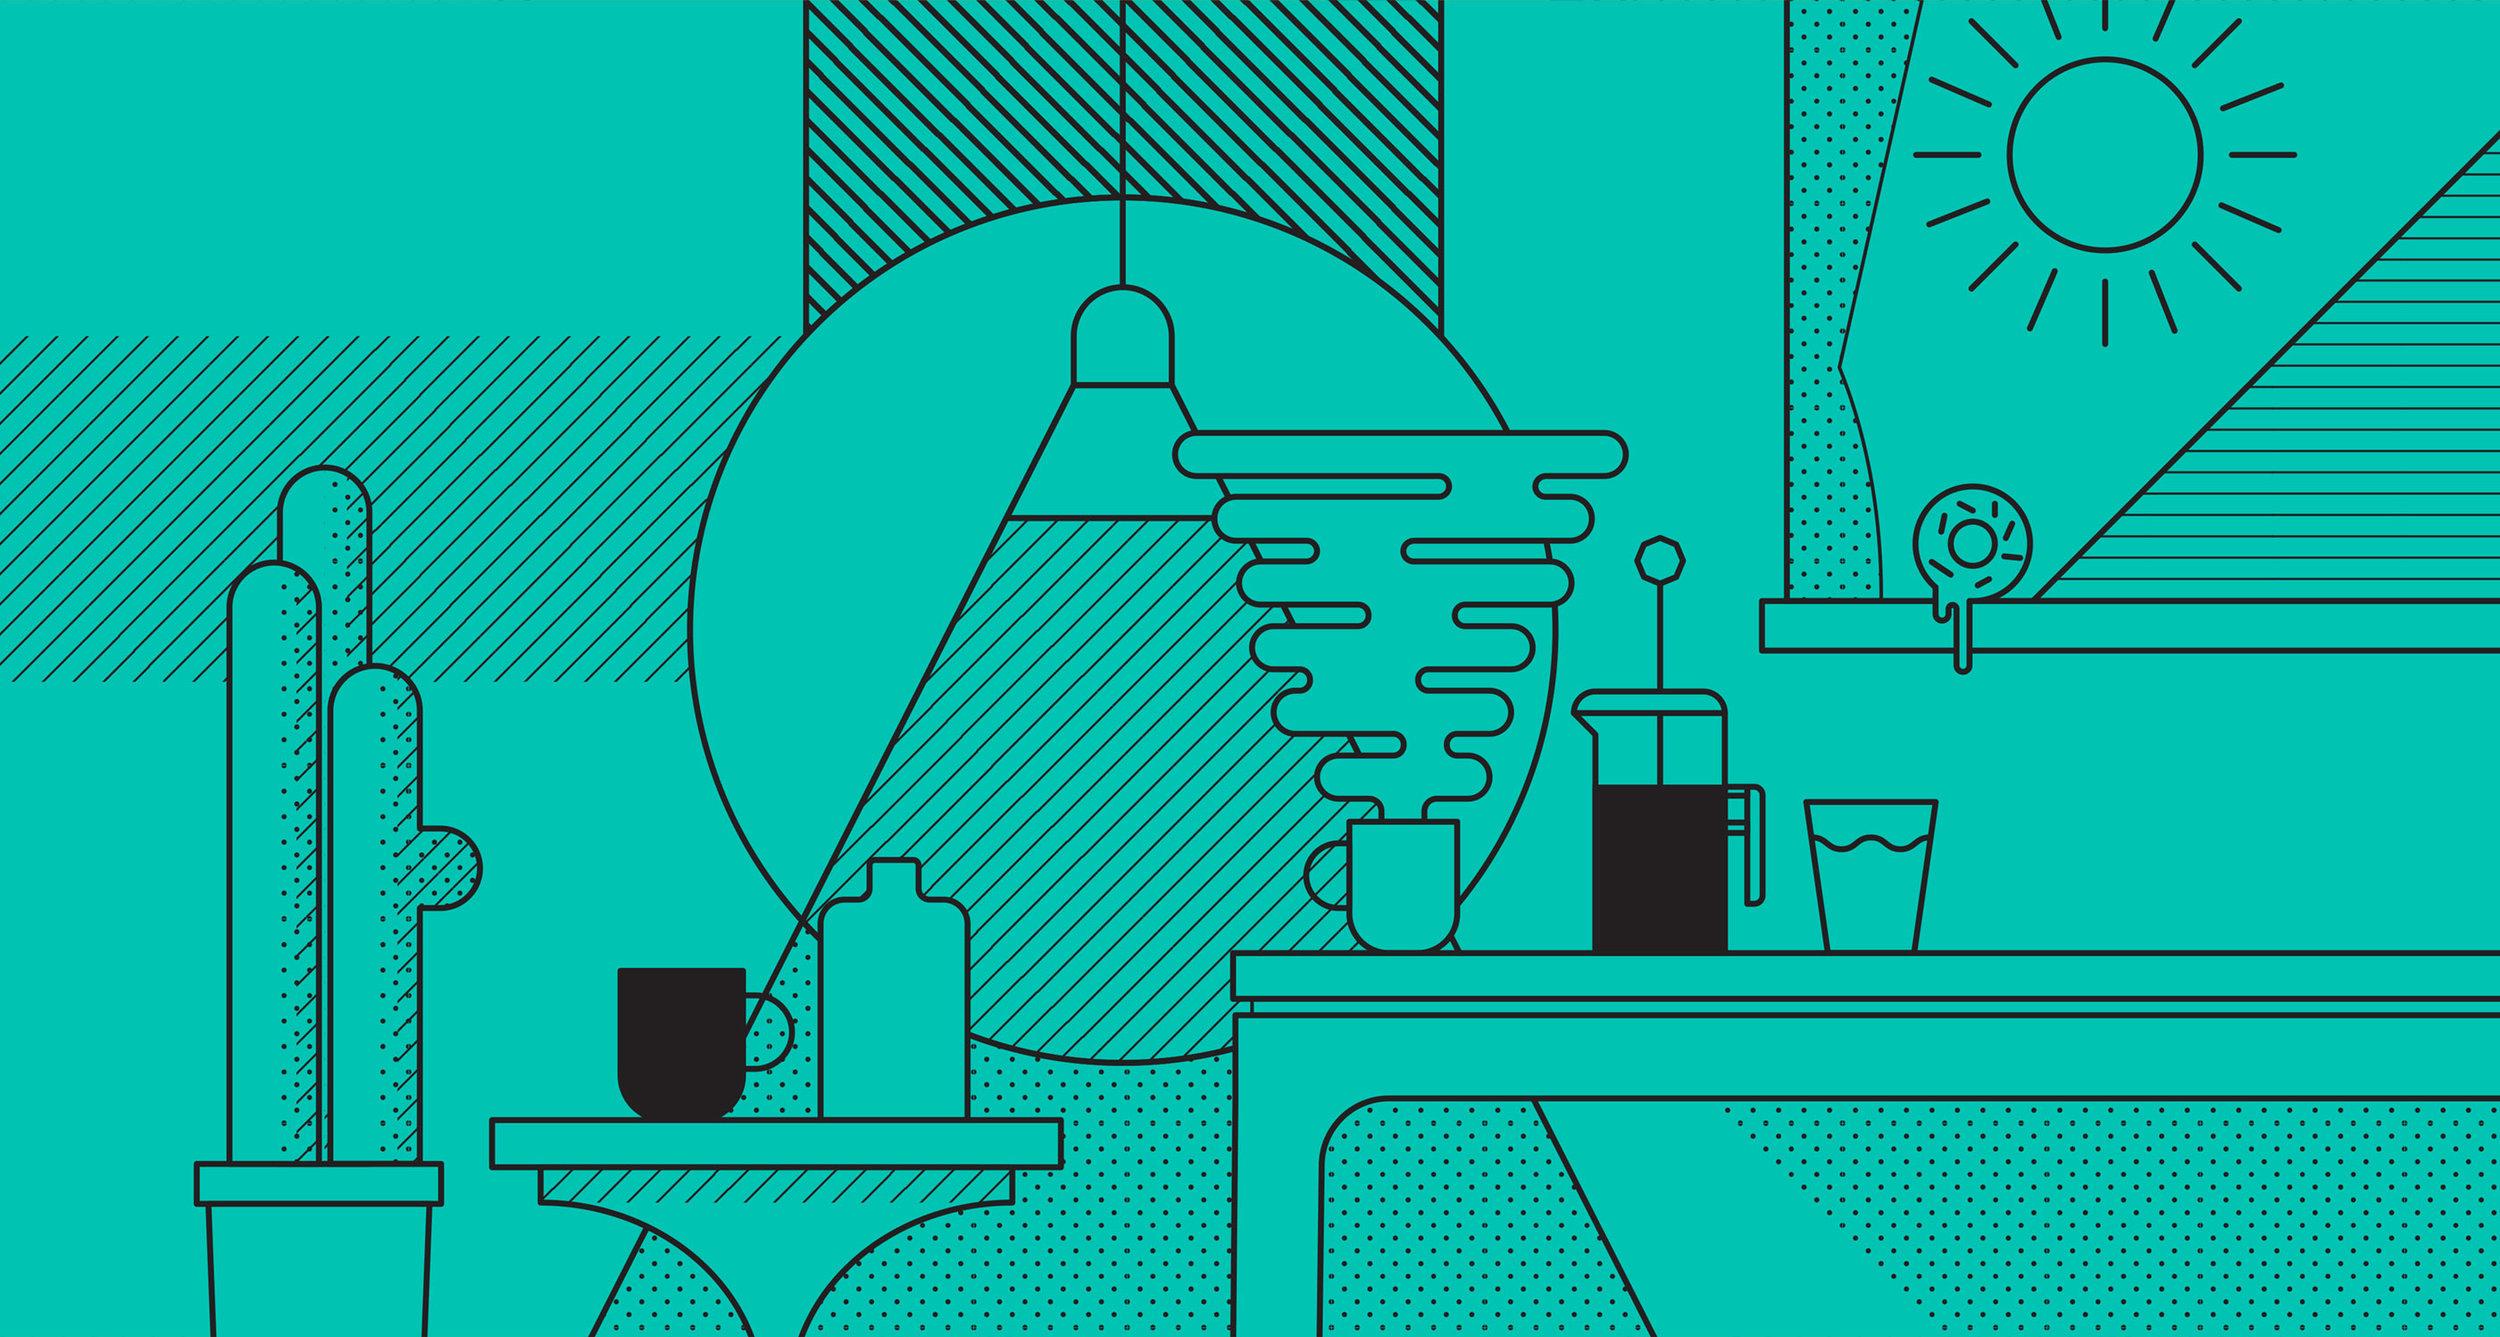 Rubia Coffee Honest Pour Illustration